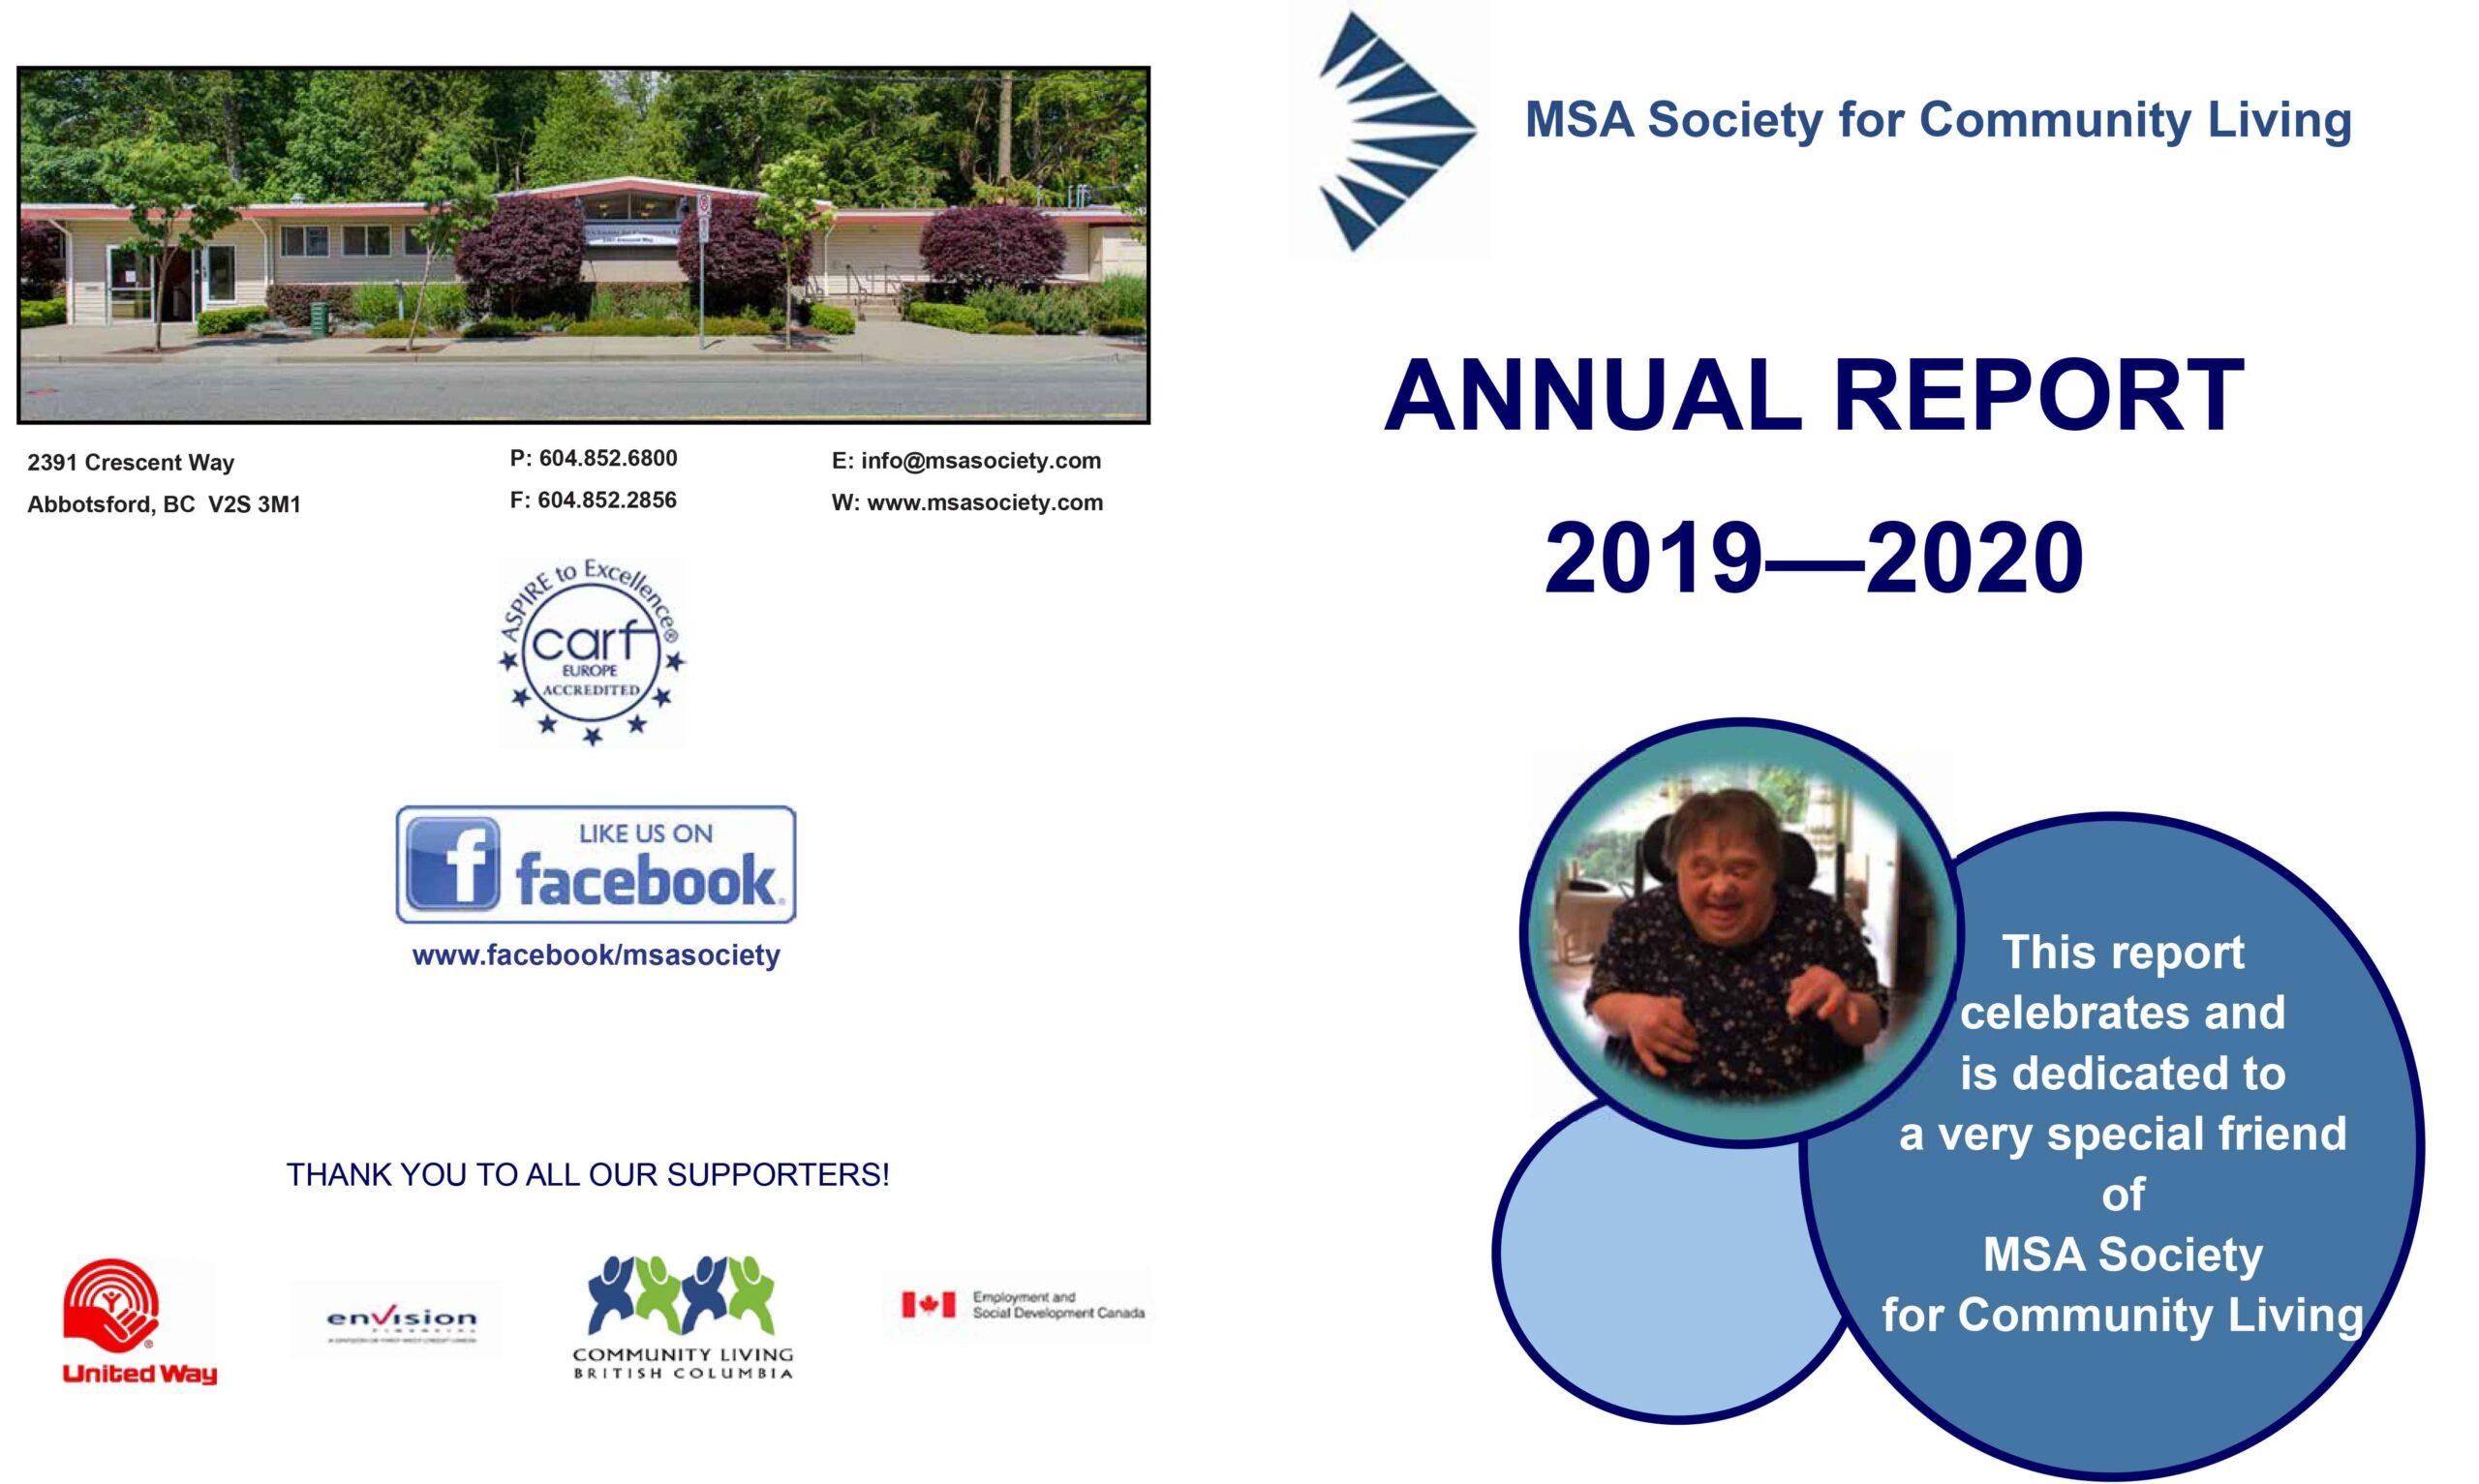 2020-Annual-Report-(1)-1